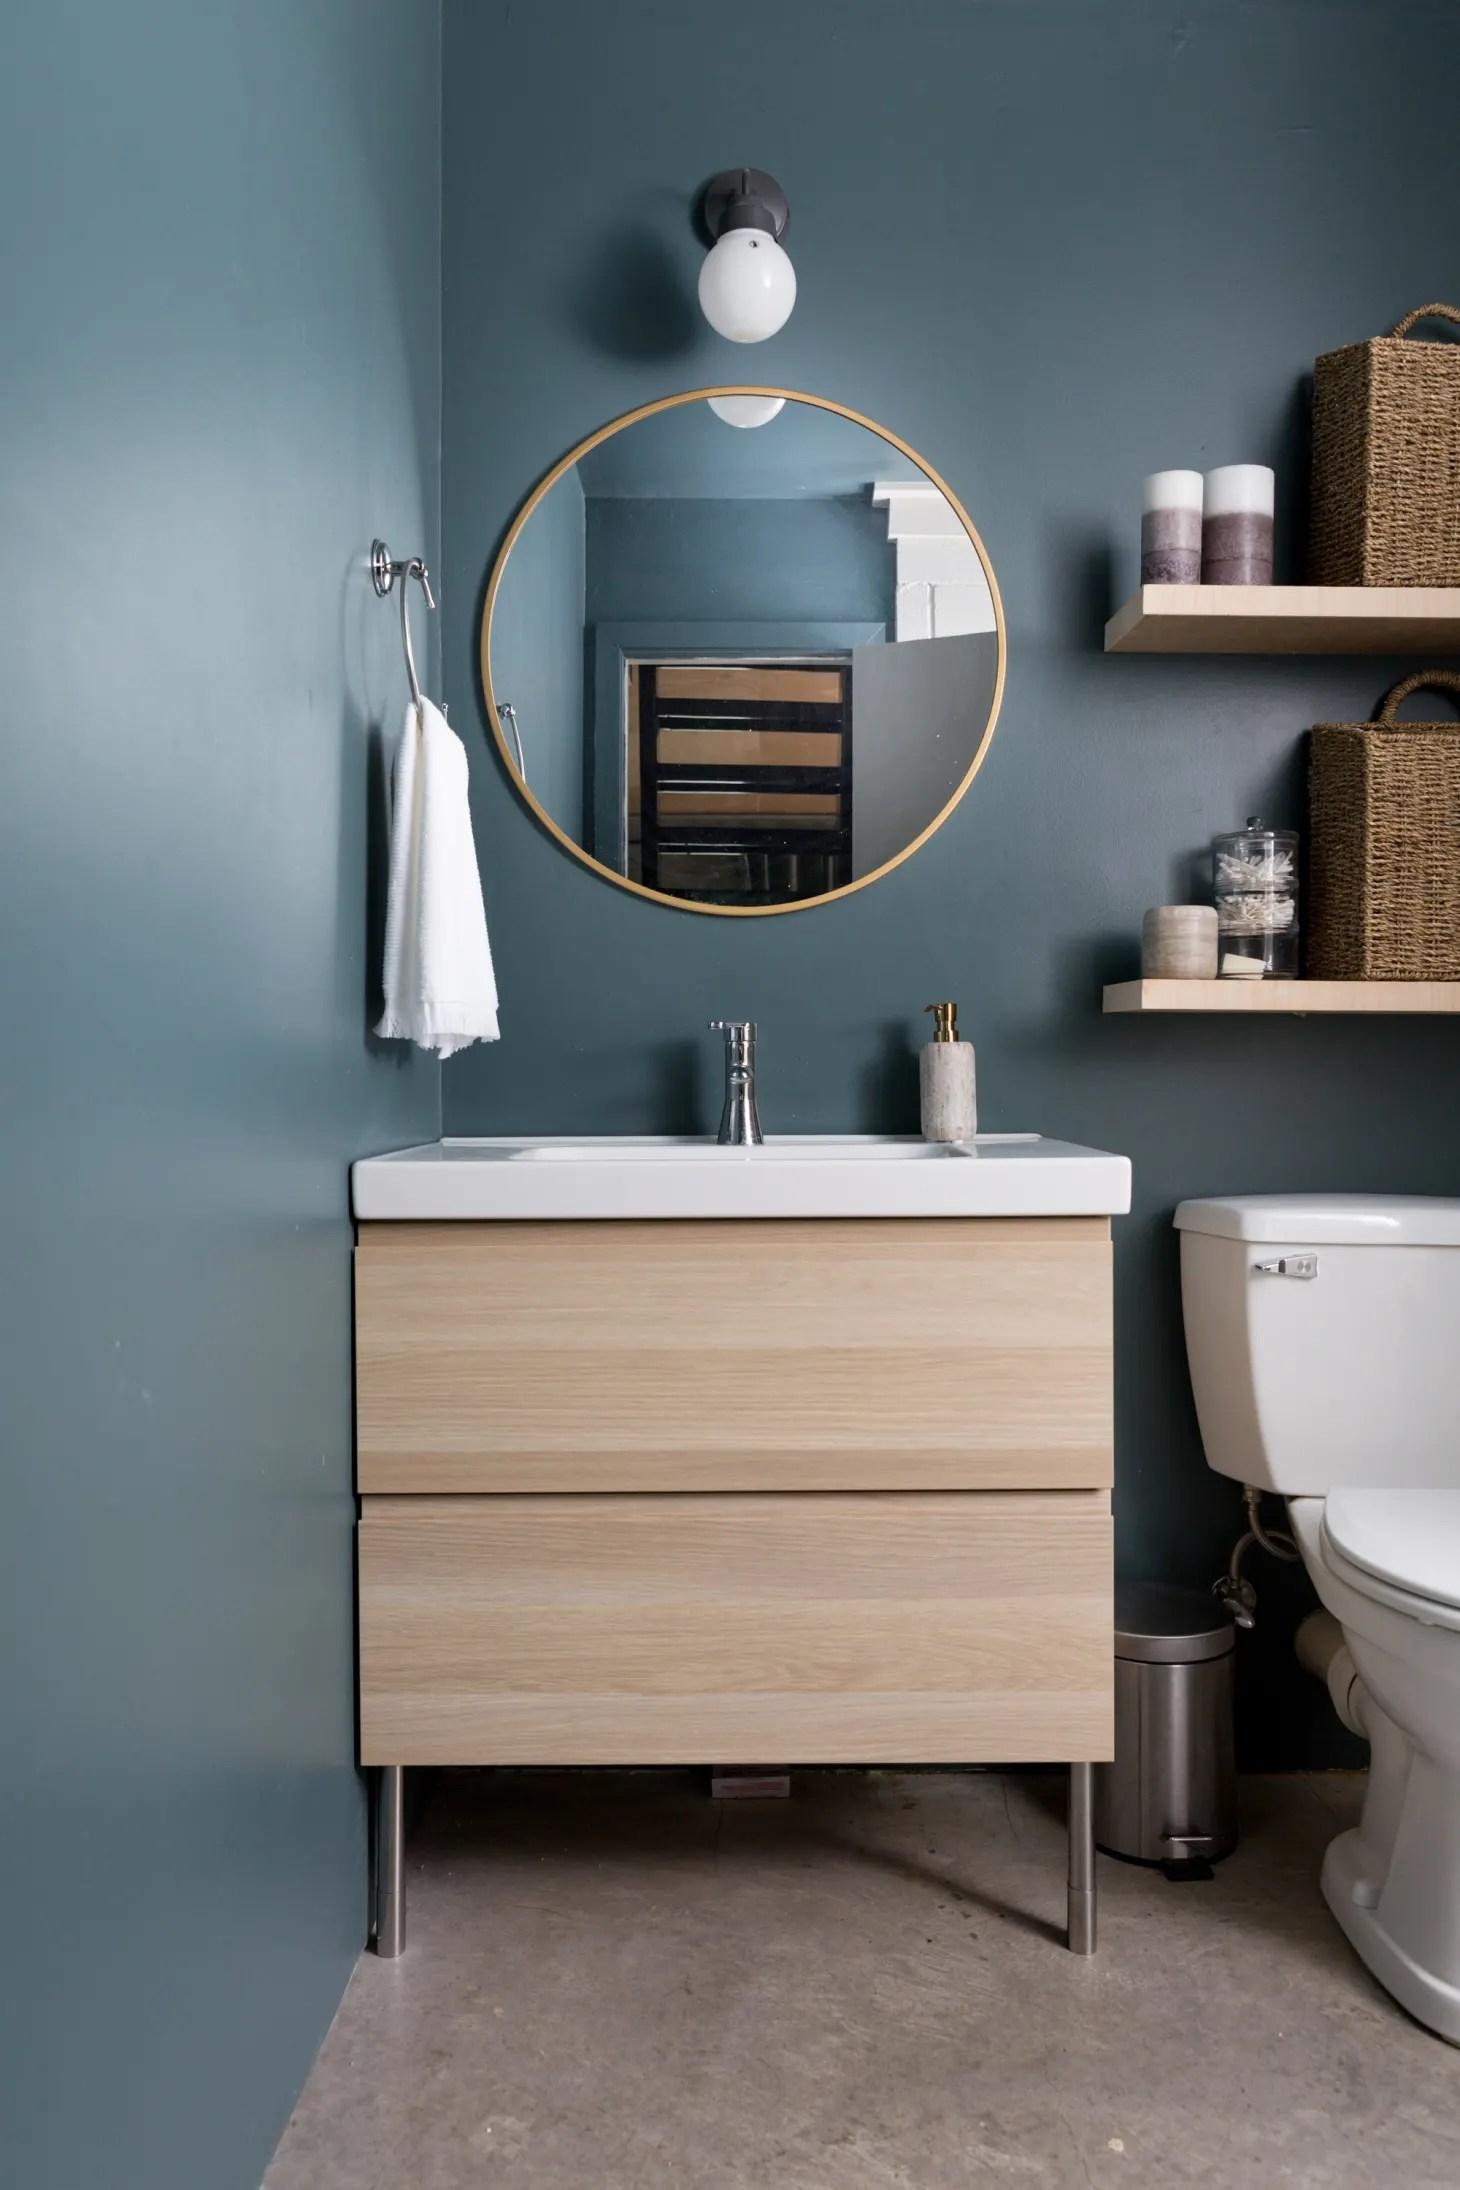 25 Small Bathroom Storage & Design Ideas - Storage ... on Small Apartment Bathroom Storage Ideas  id=34264